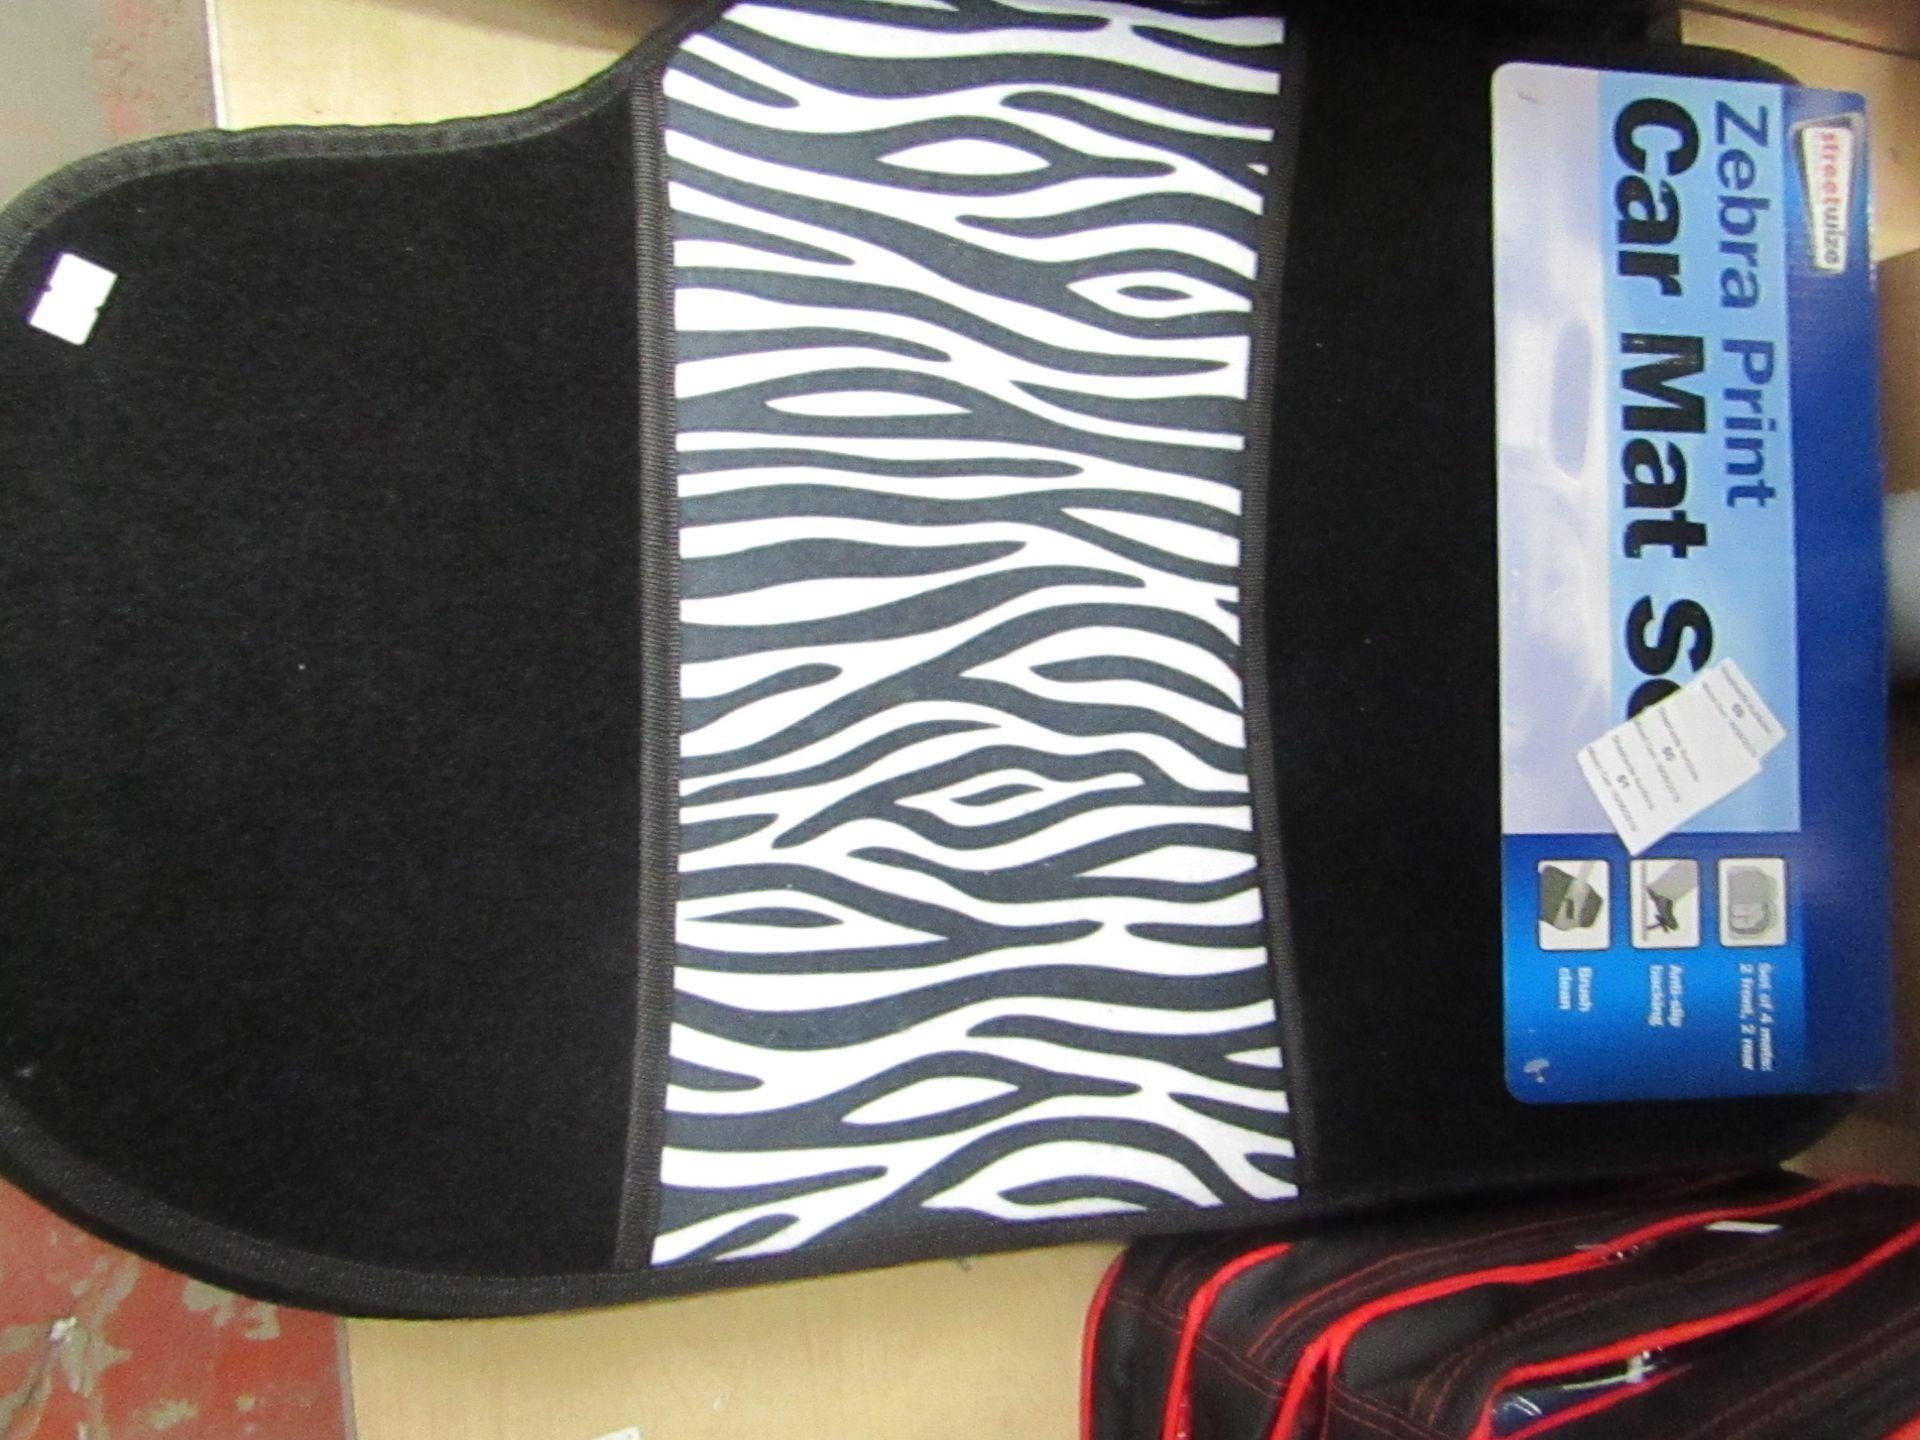 Lot 59 - Streetwise Zebra Print 4 piece car mat set, new with POS still attached